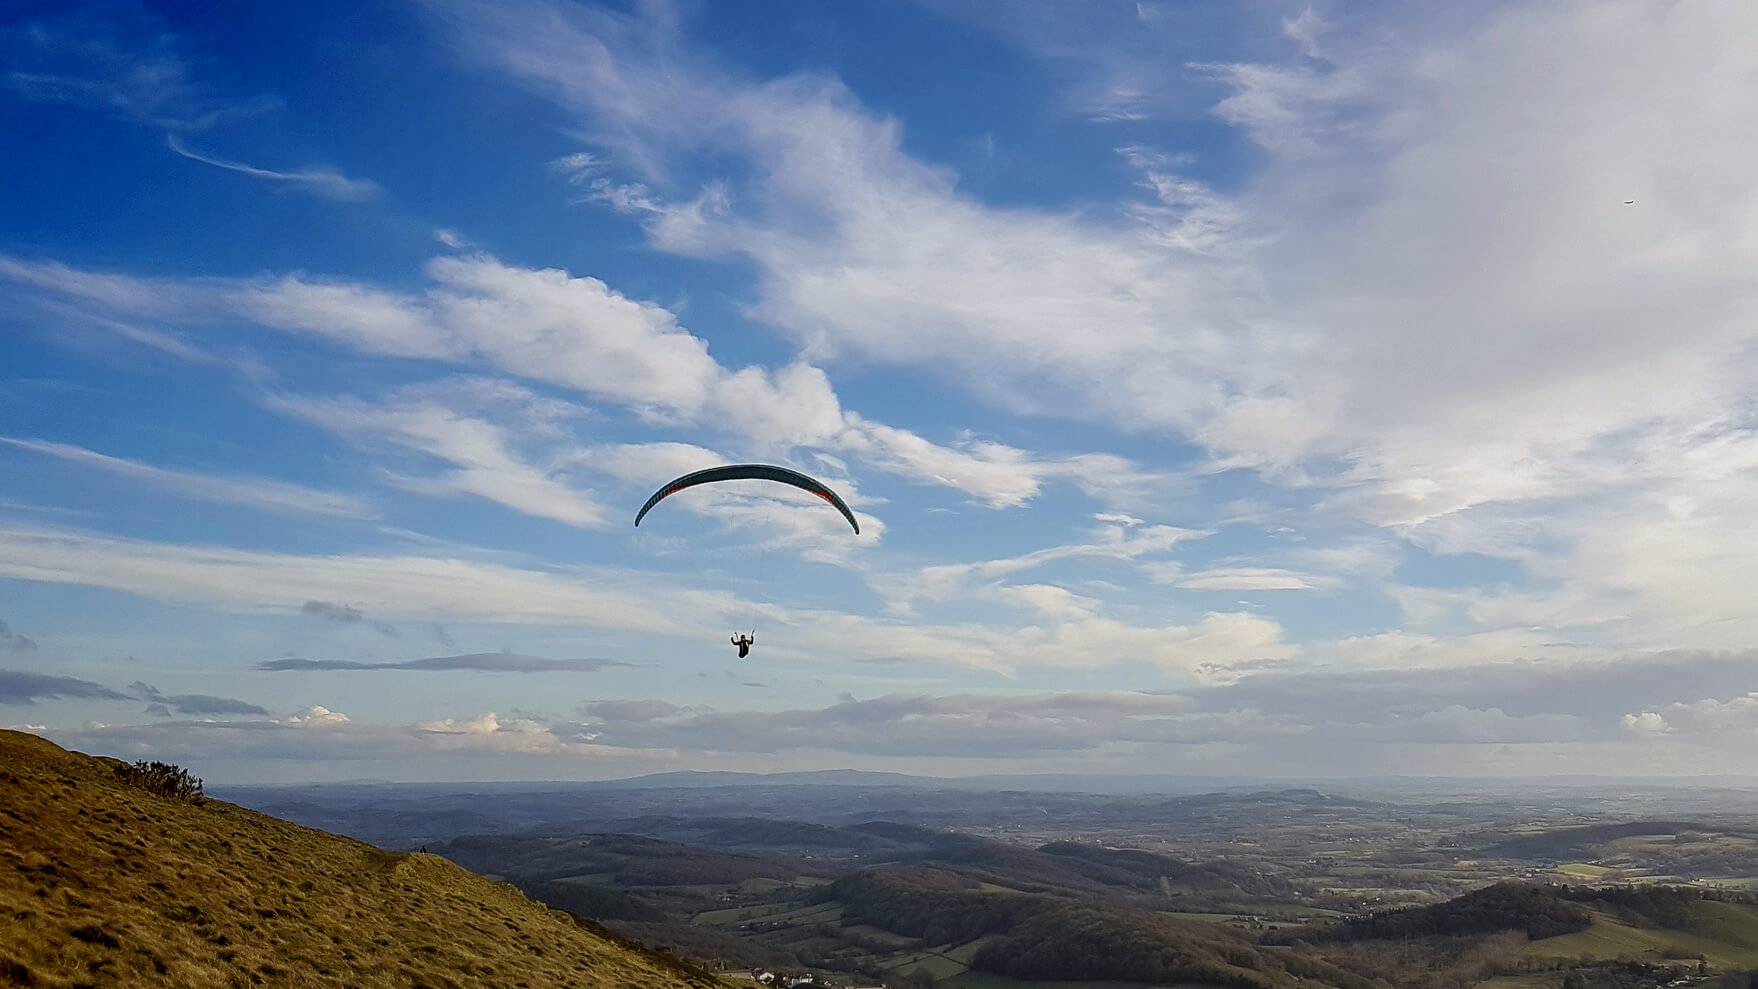 Loty na paralotniach i motoparalotniach to okazja do spojrzenia z góry na najpiękniejsze zakątki Polski